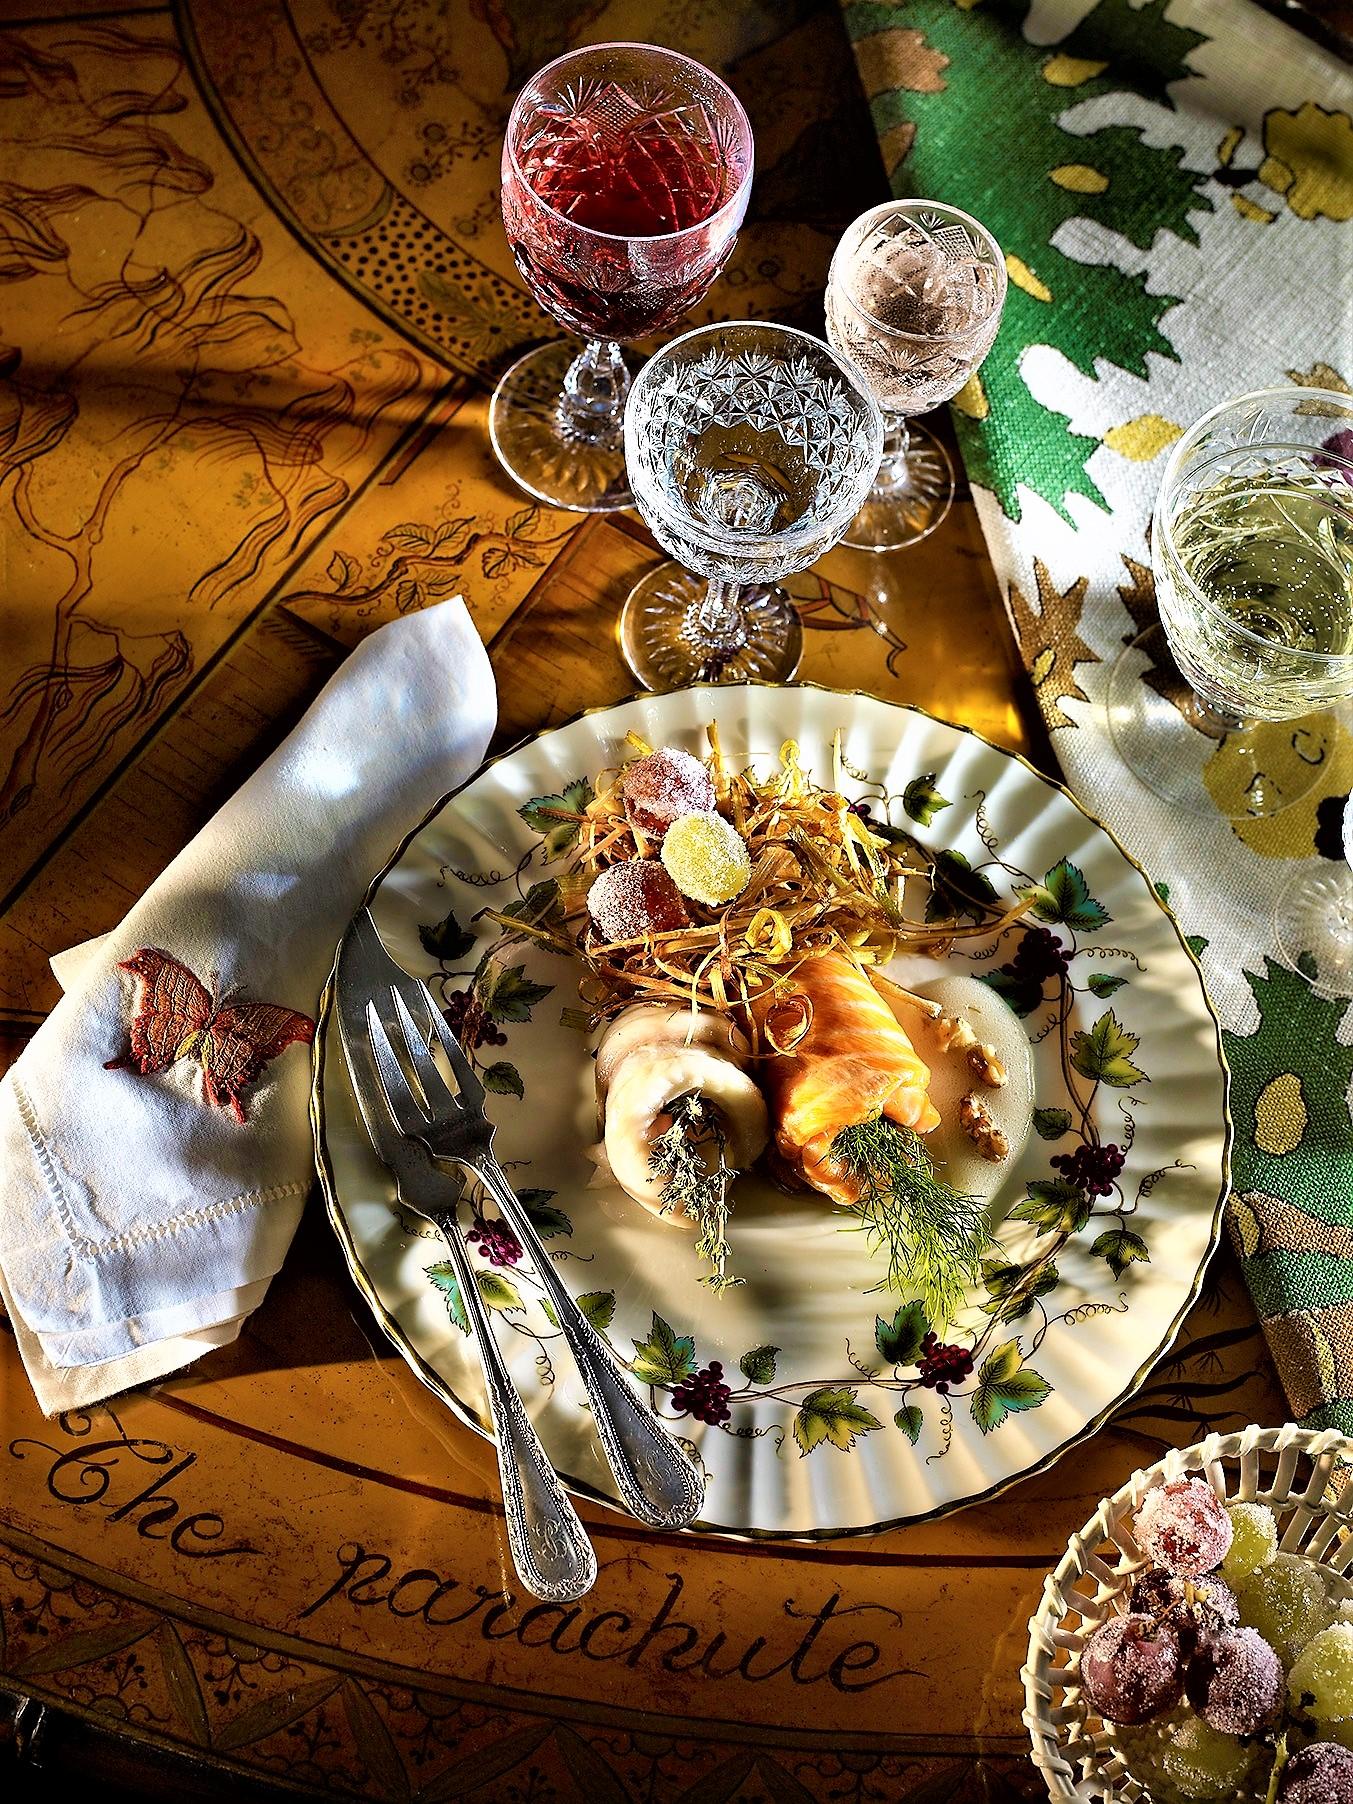 Curso de navidad curso de cocina escuela de cocina telva - Curso de cocina para solteros ...